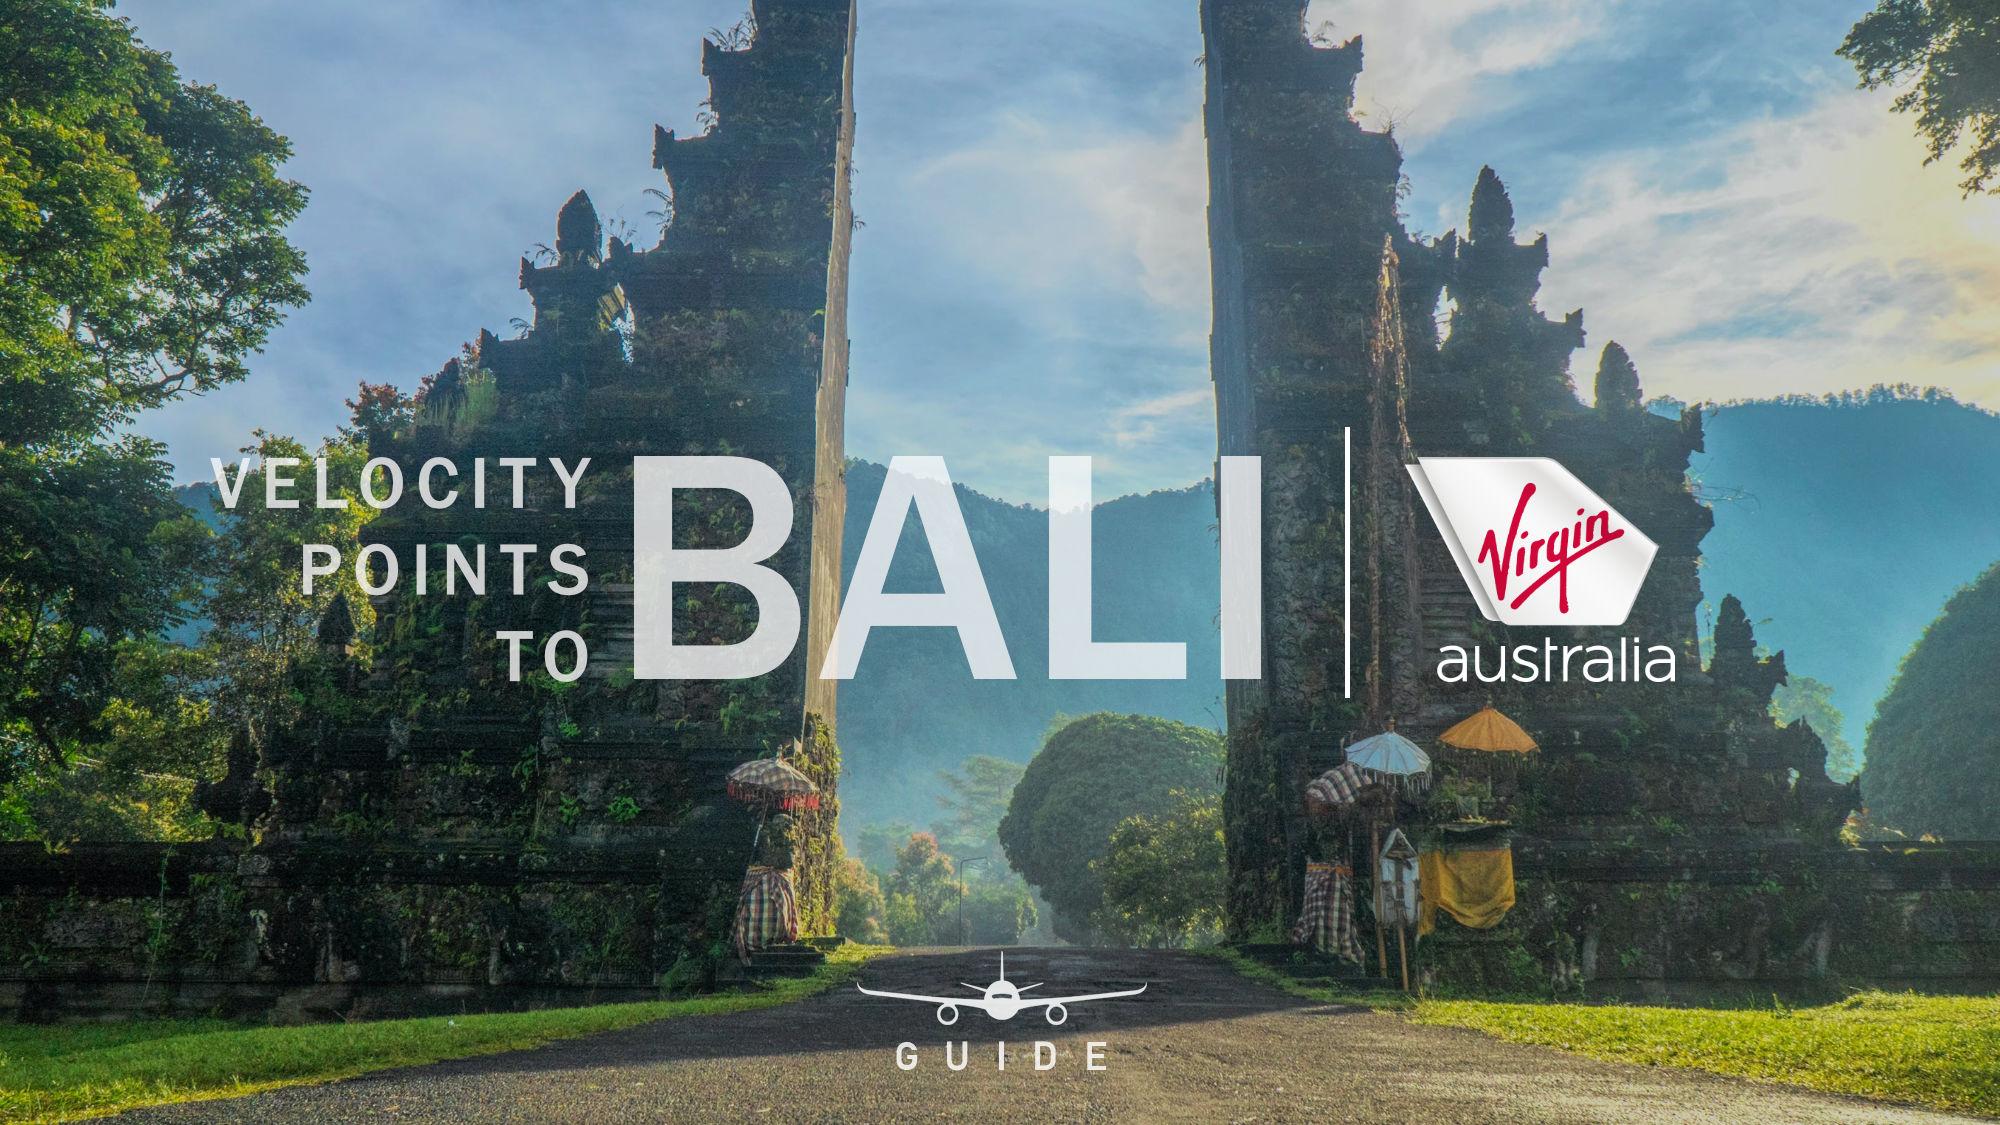 Velocity Points to Bali